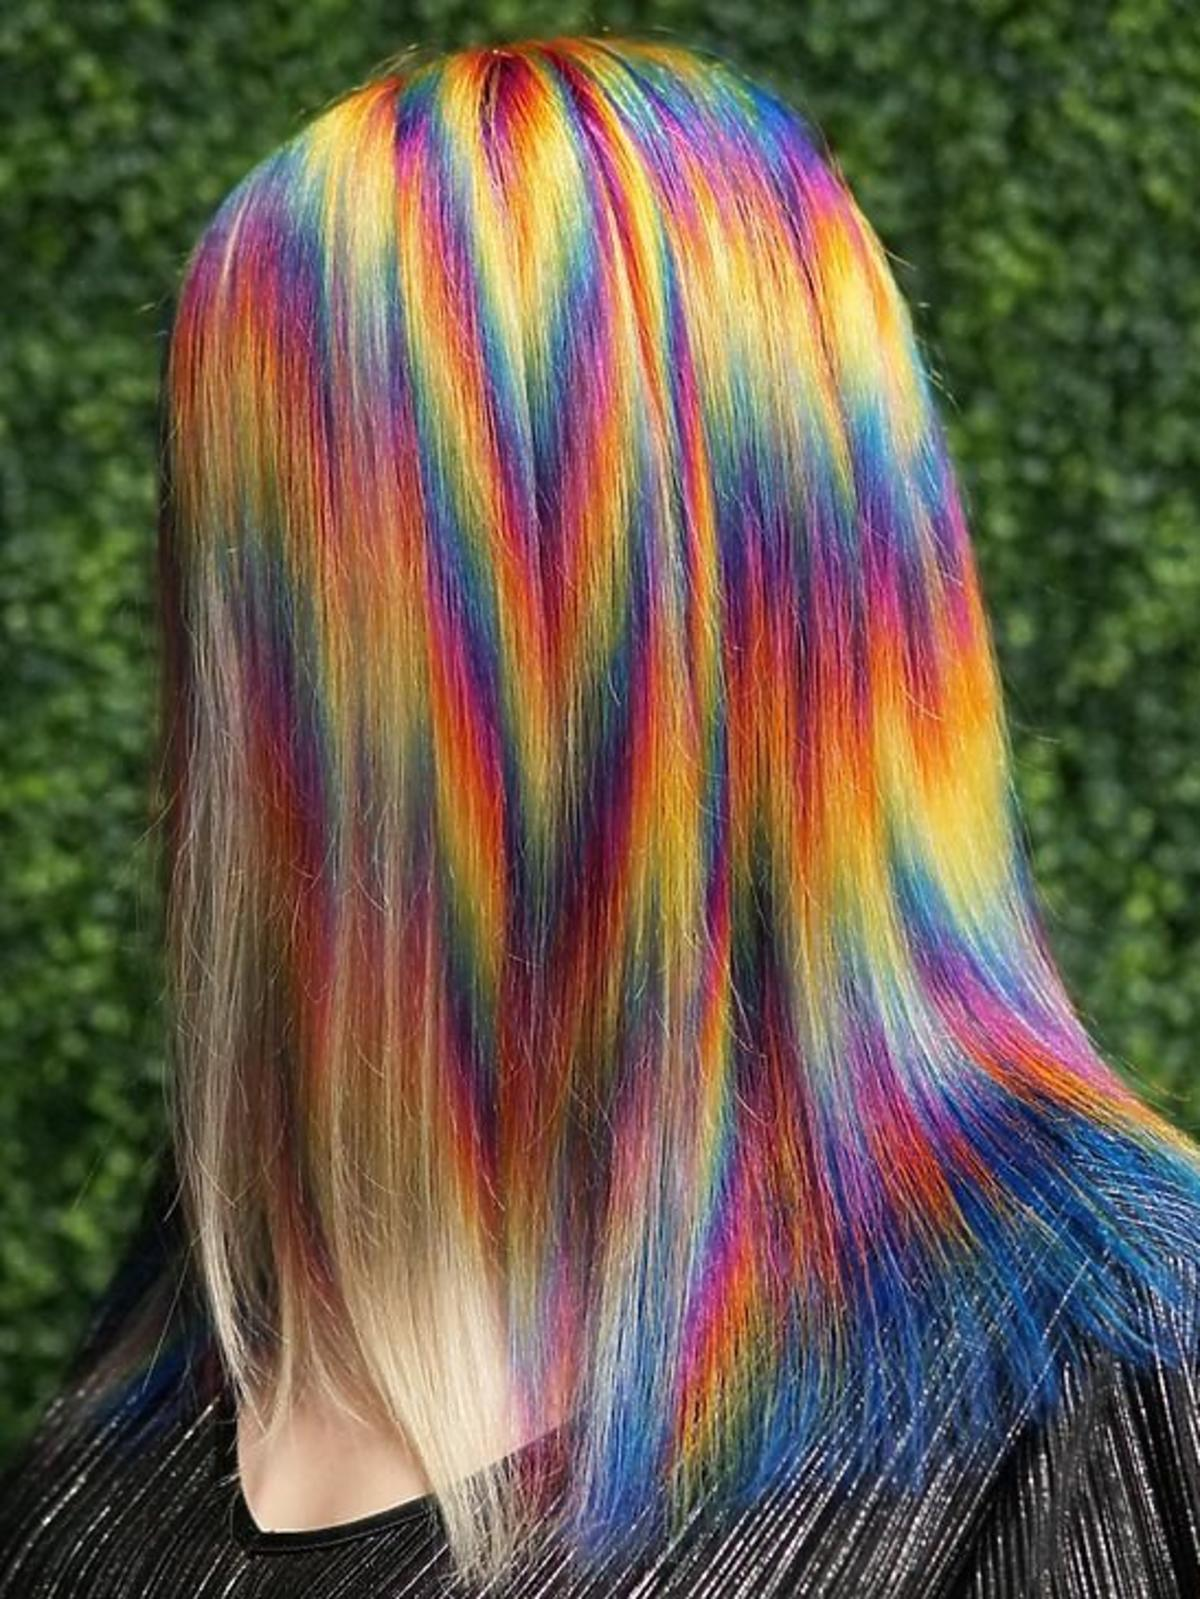 Szalona koloryzacja tie-dye